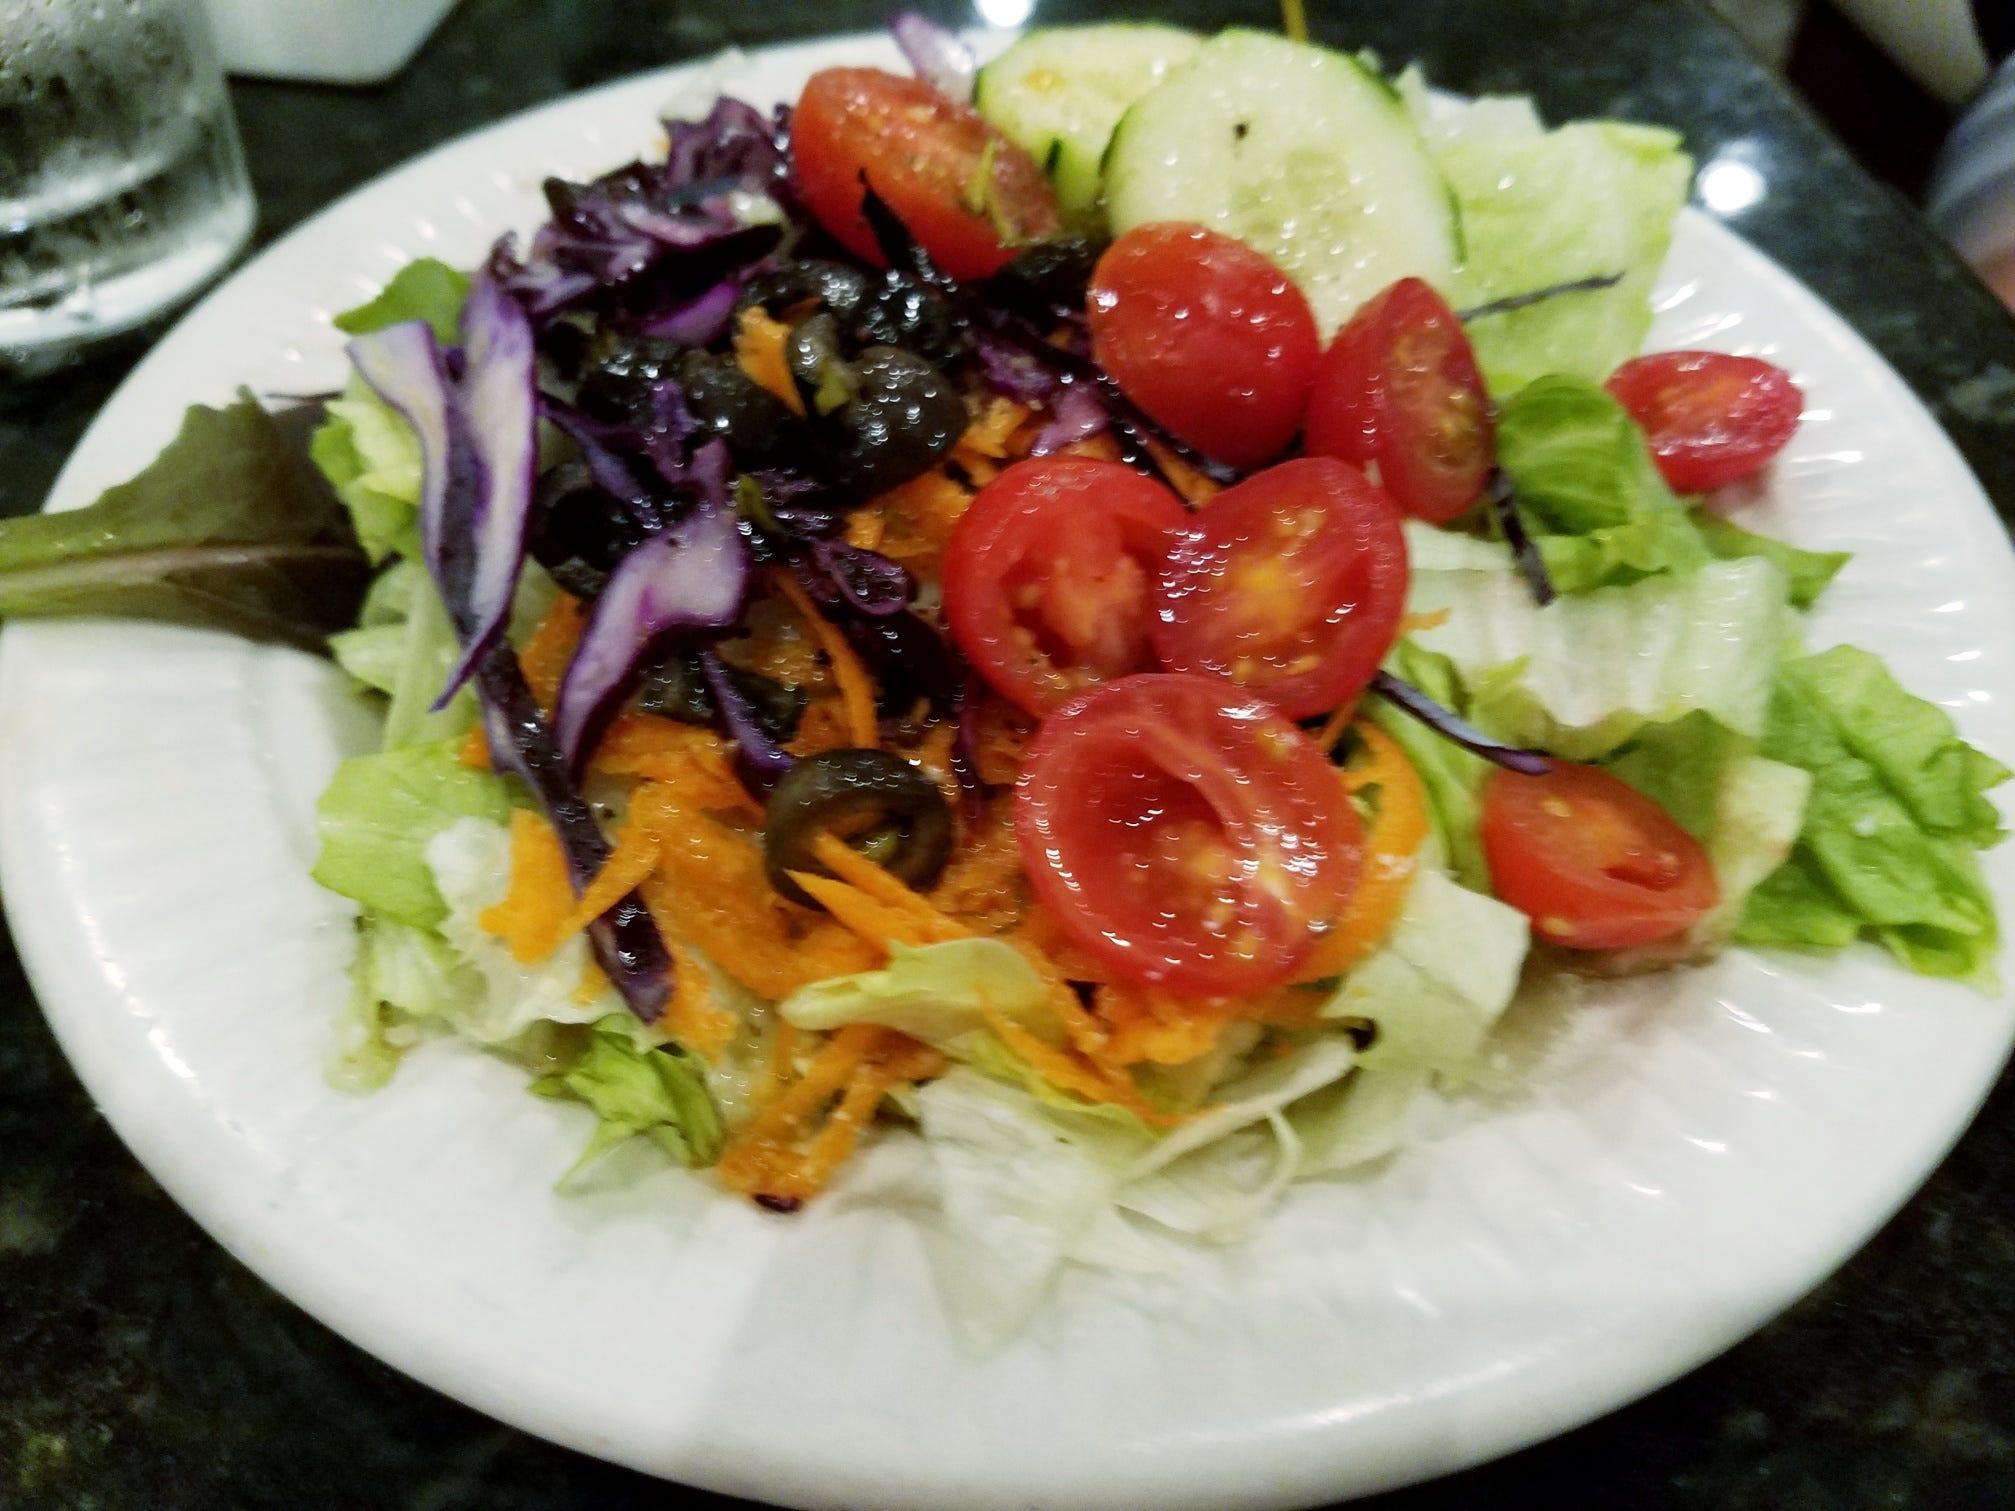 The house salad had a crisp lettuce blend with plenty of fresh vegetables in a tart Italian dressing.